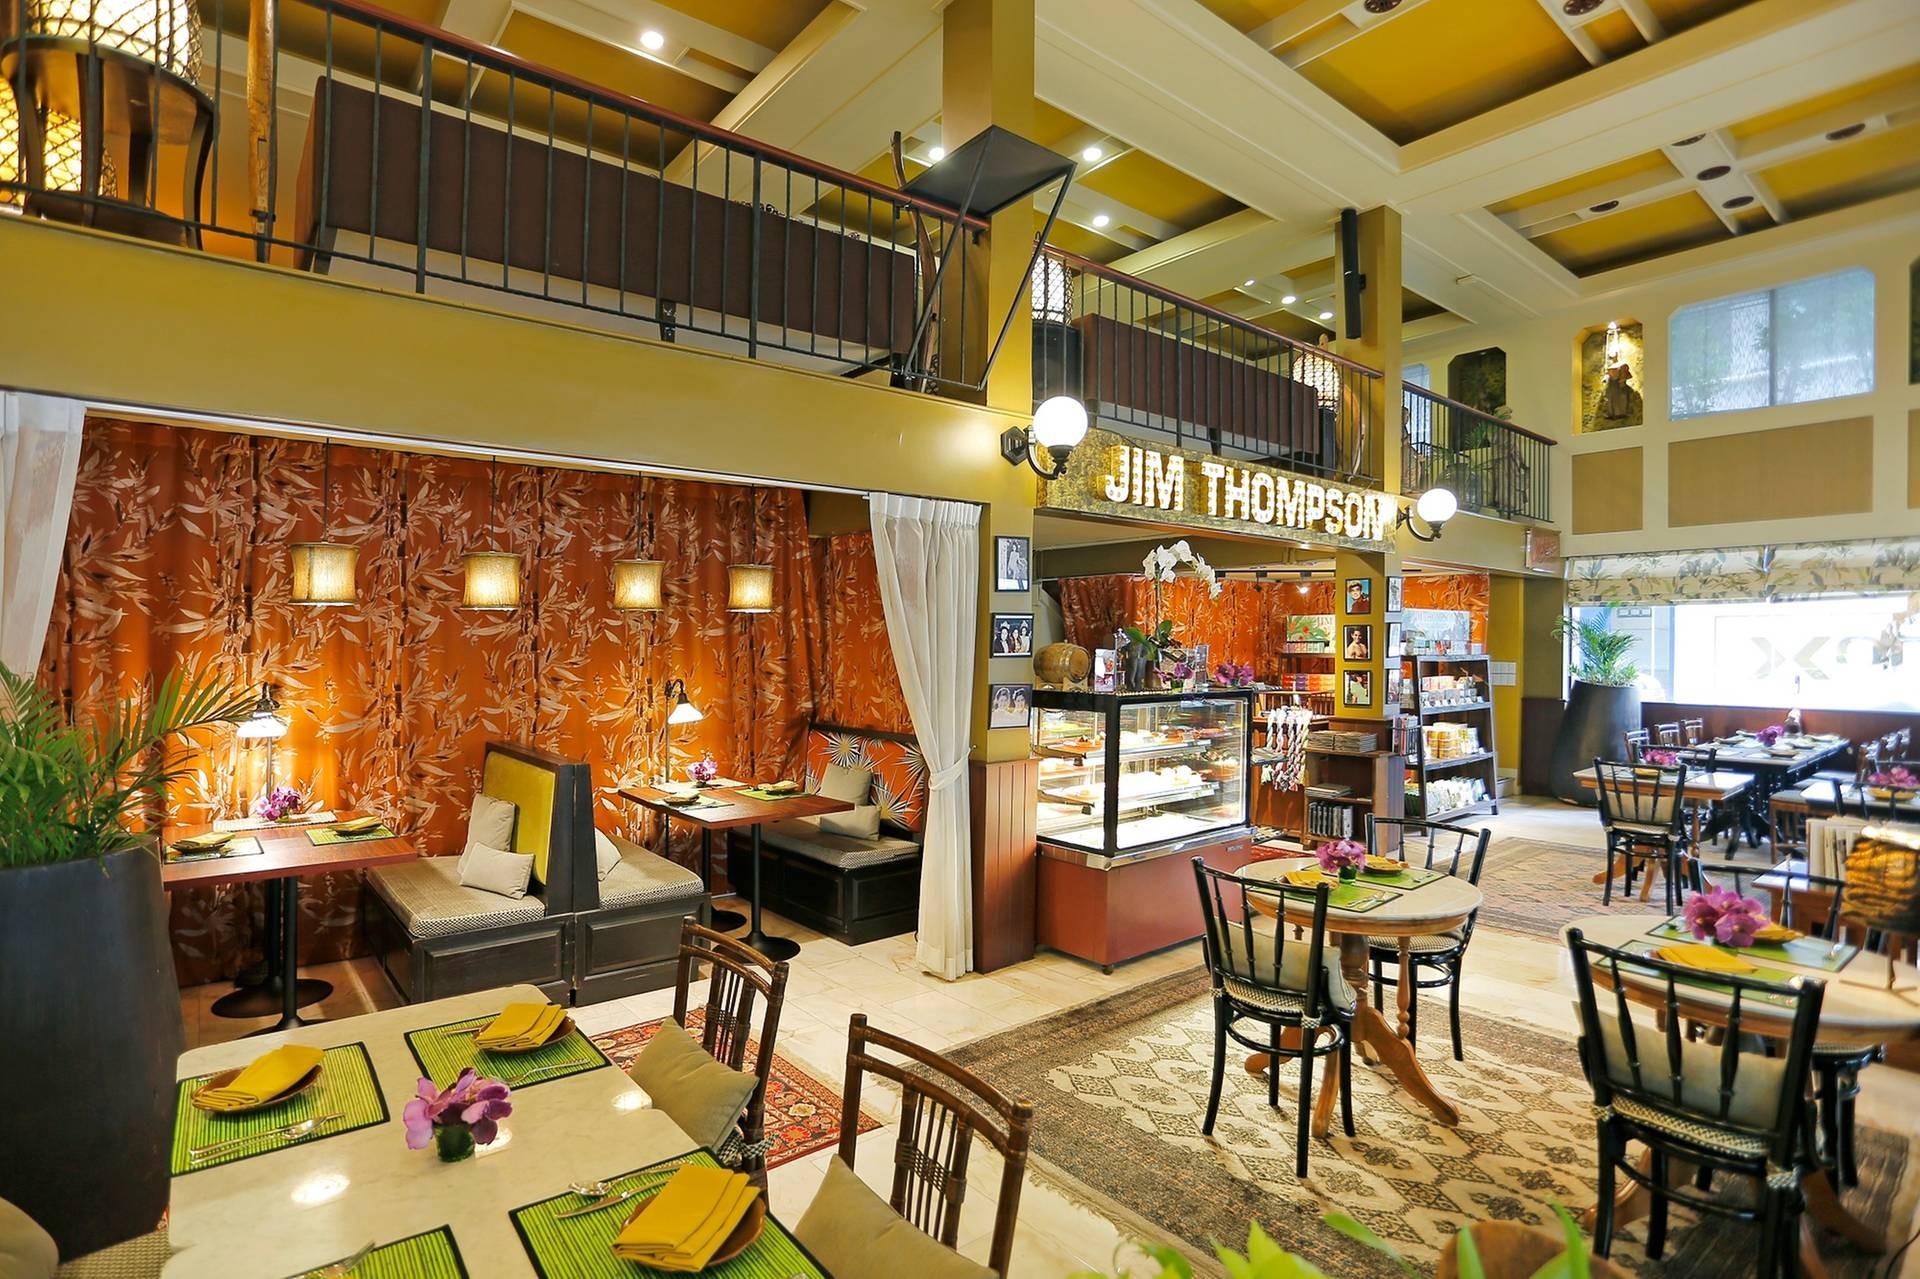 Jim Thompson Restaurant and Lounge ถนน สุรวงศ์